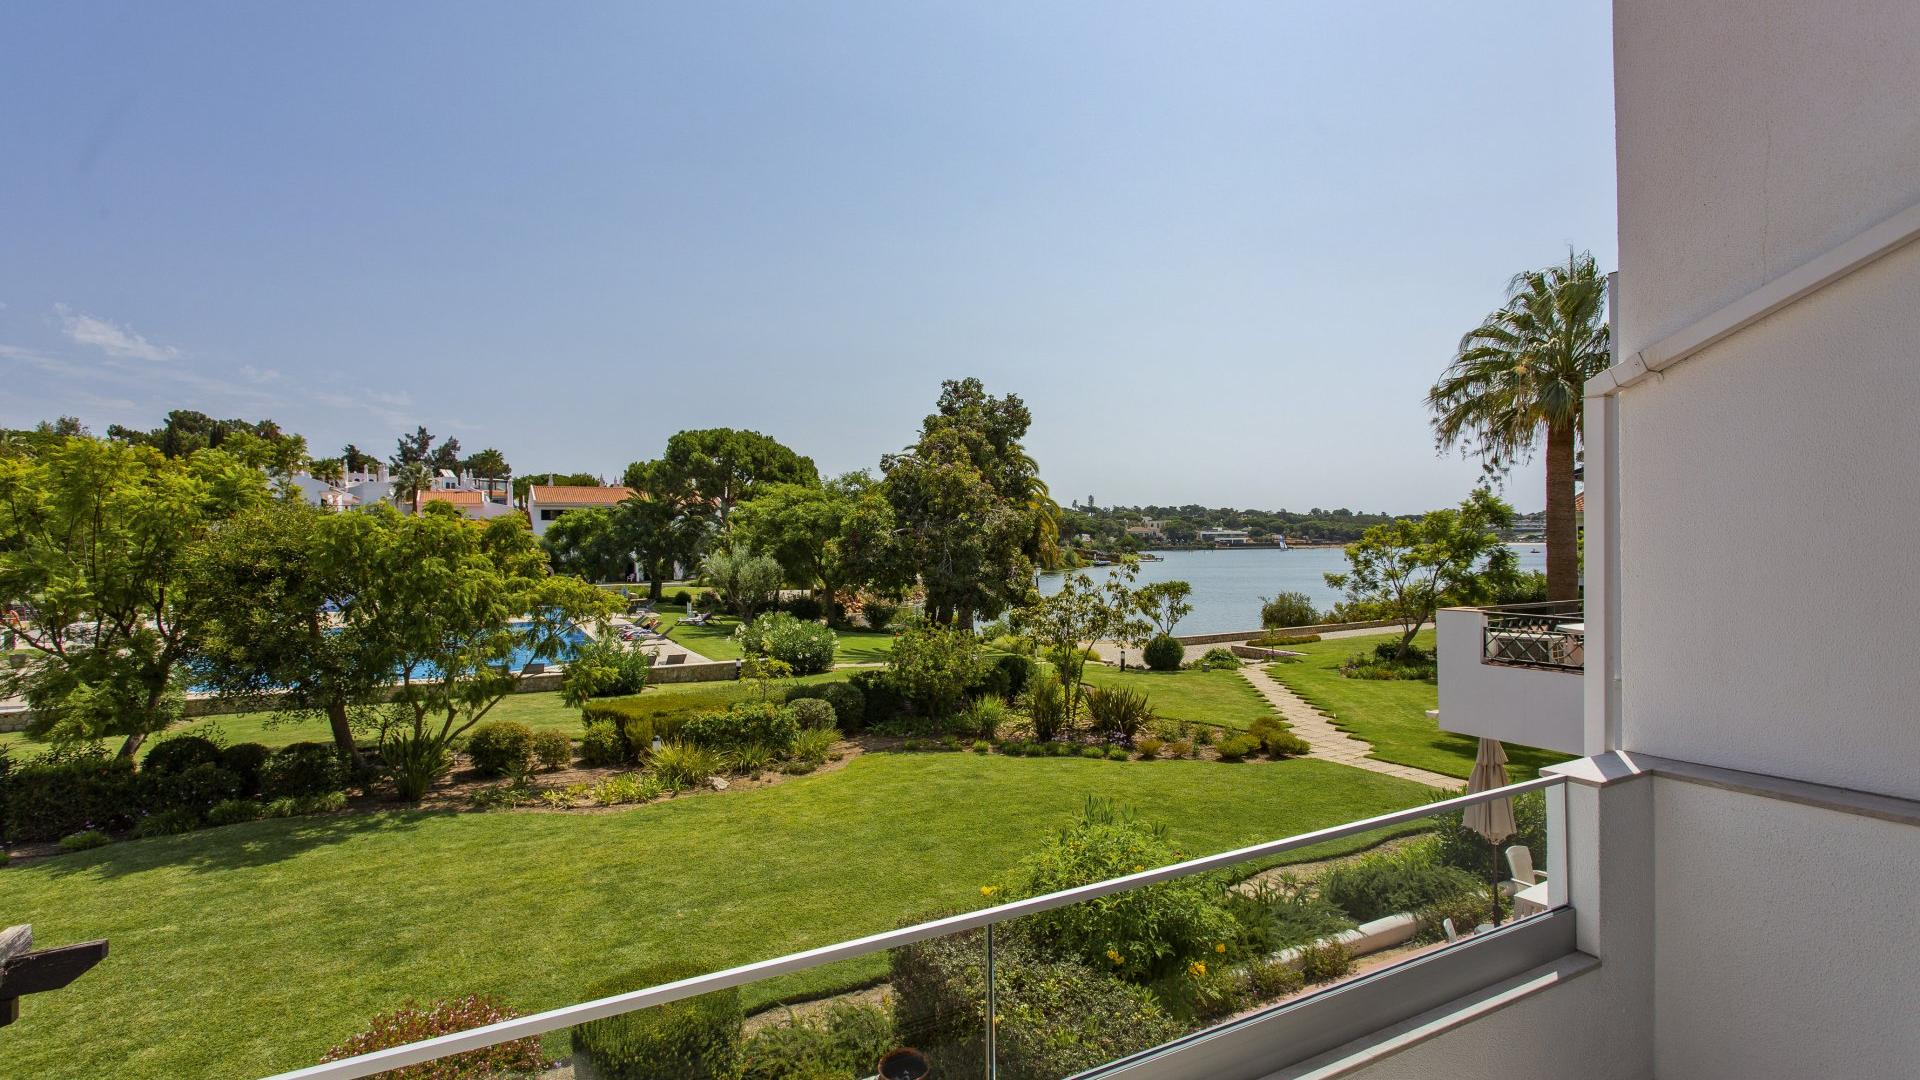 Apartment Starfish - Lakeside Village, Quinta do Lago, Algarve - _O5A7128_1.jpg